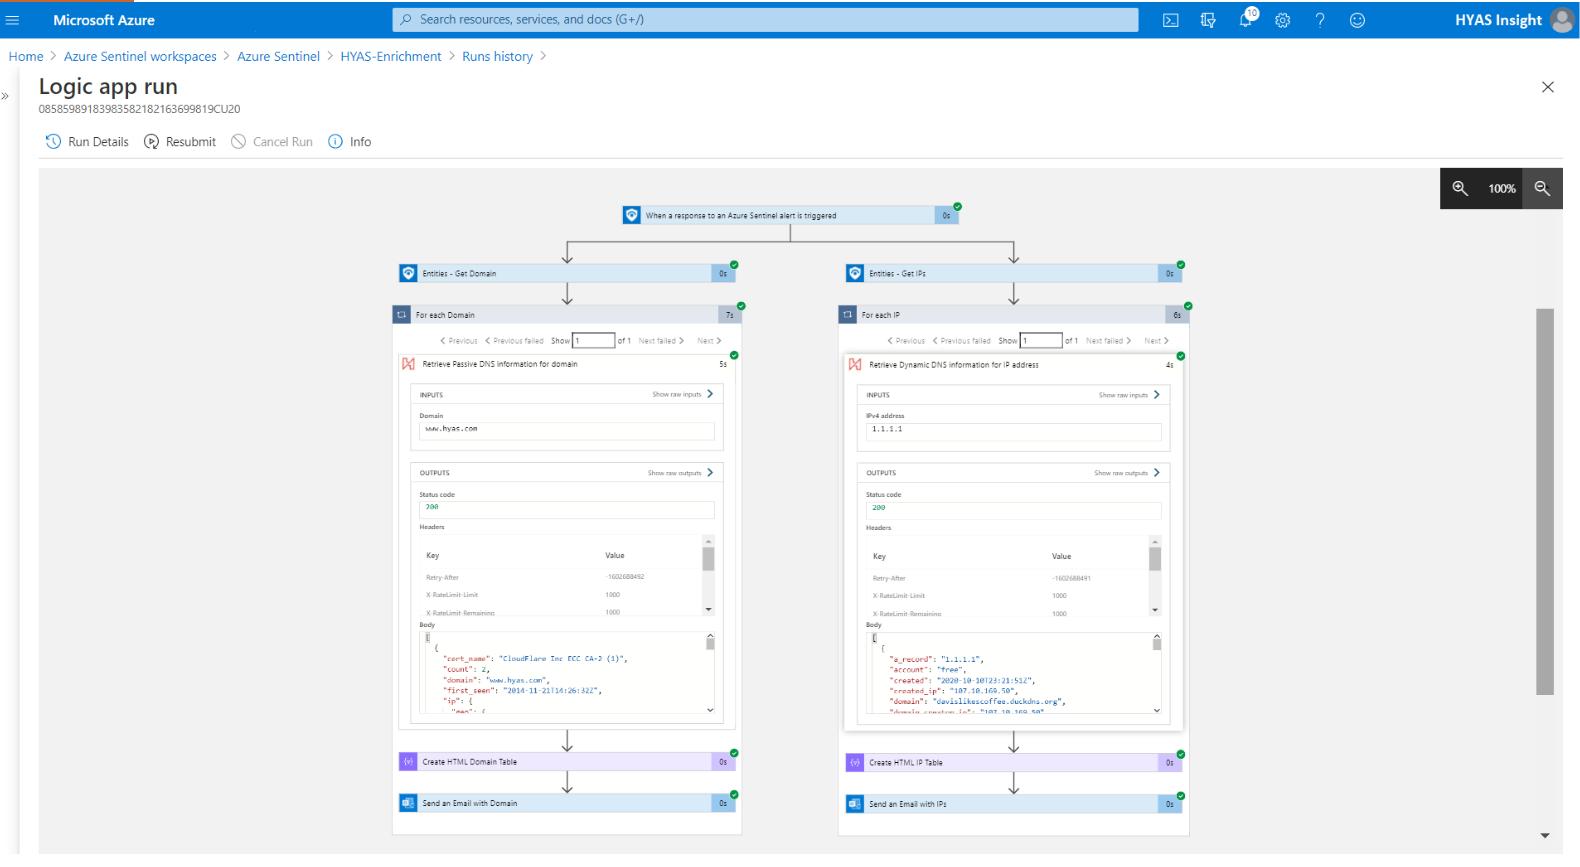 Microsoft-Azure-Sentinel-LogicApp.image 2